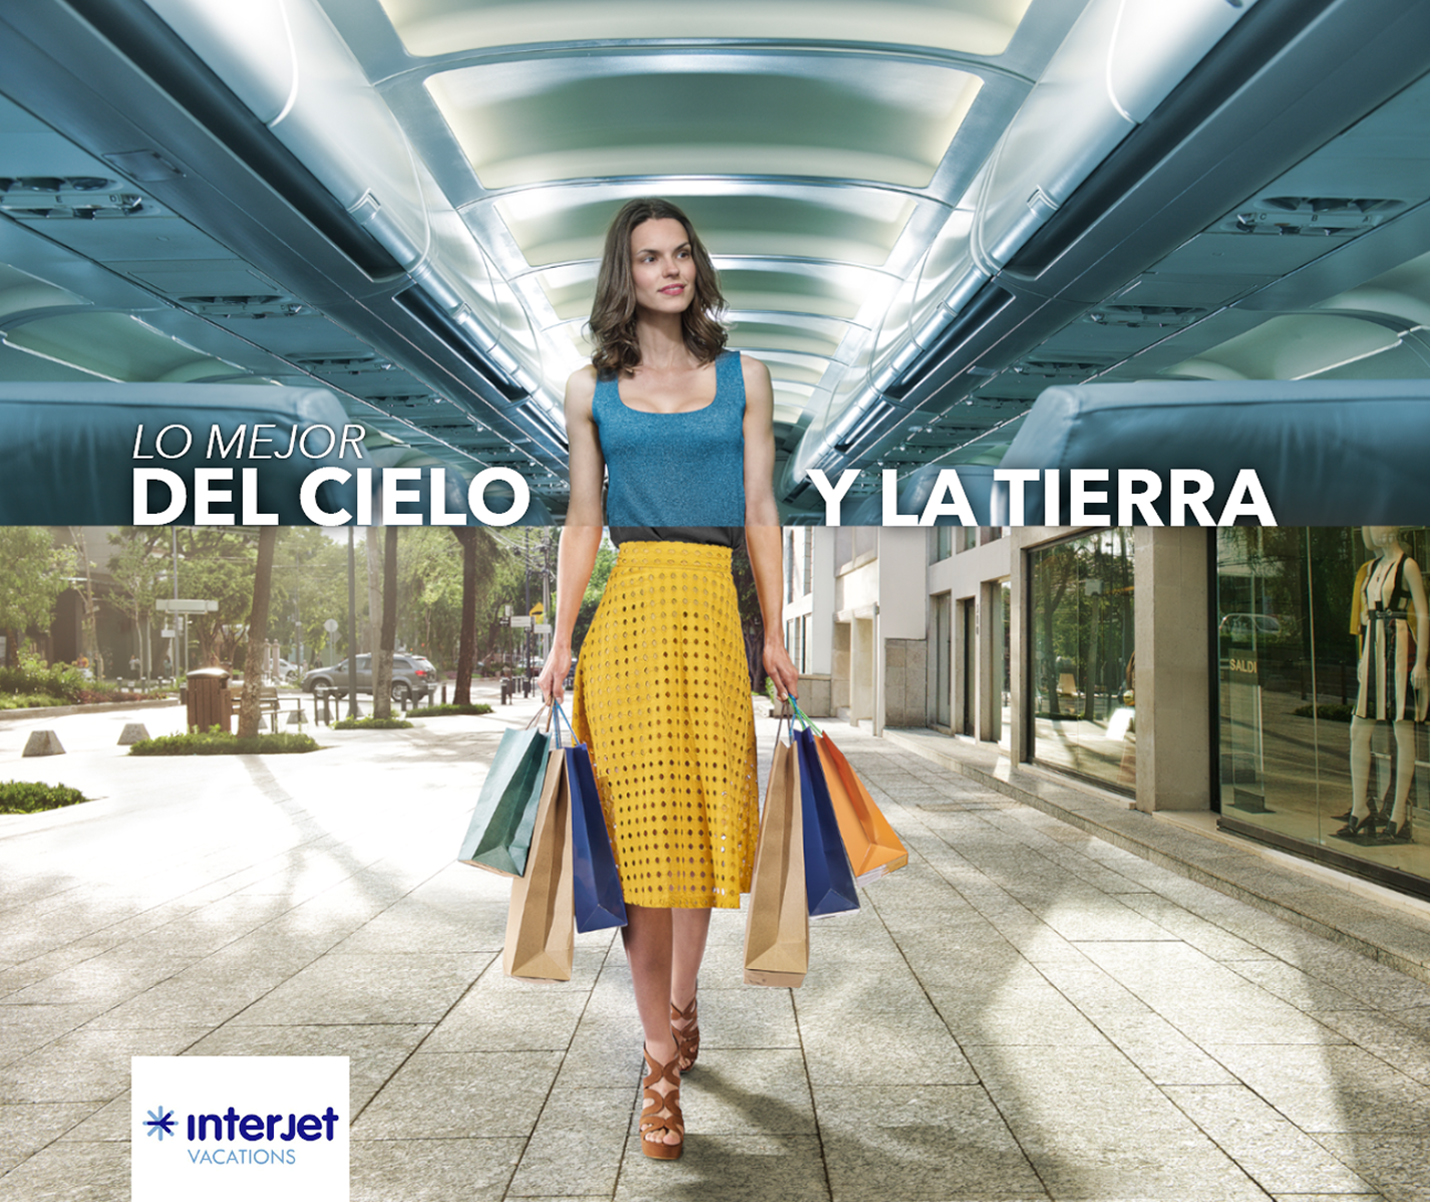 compras_interjet.jpg